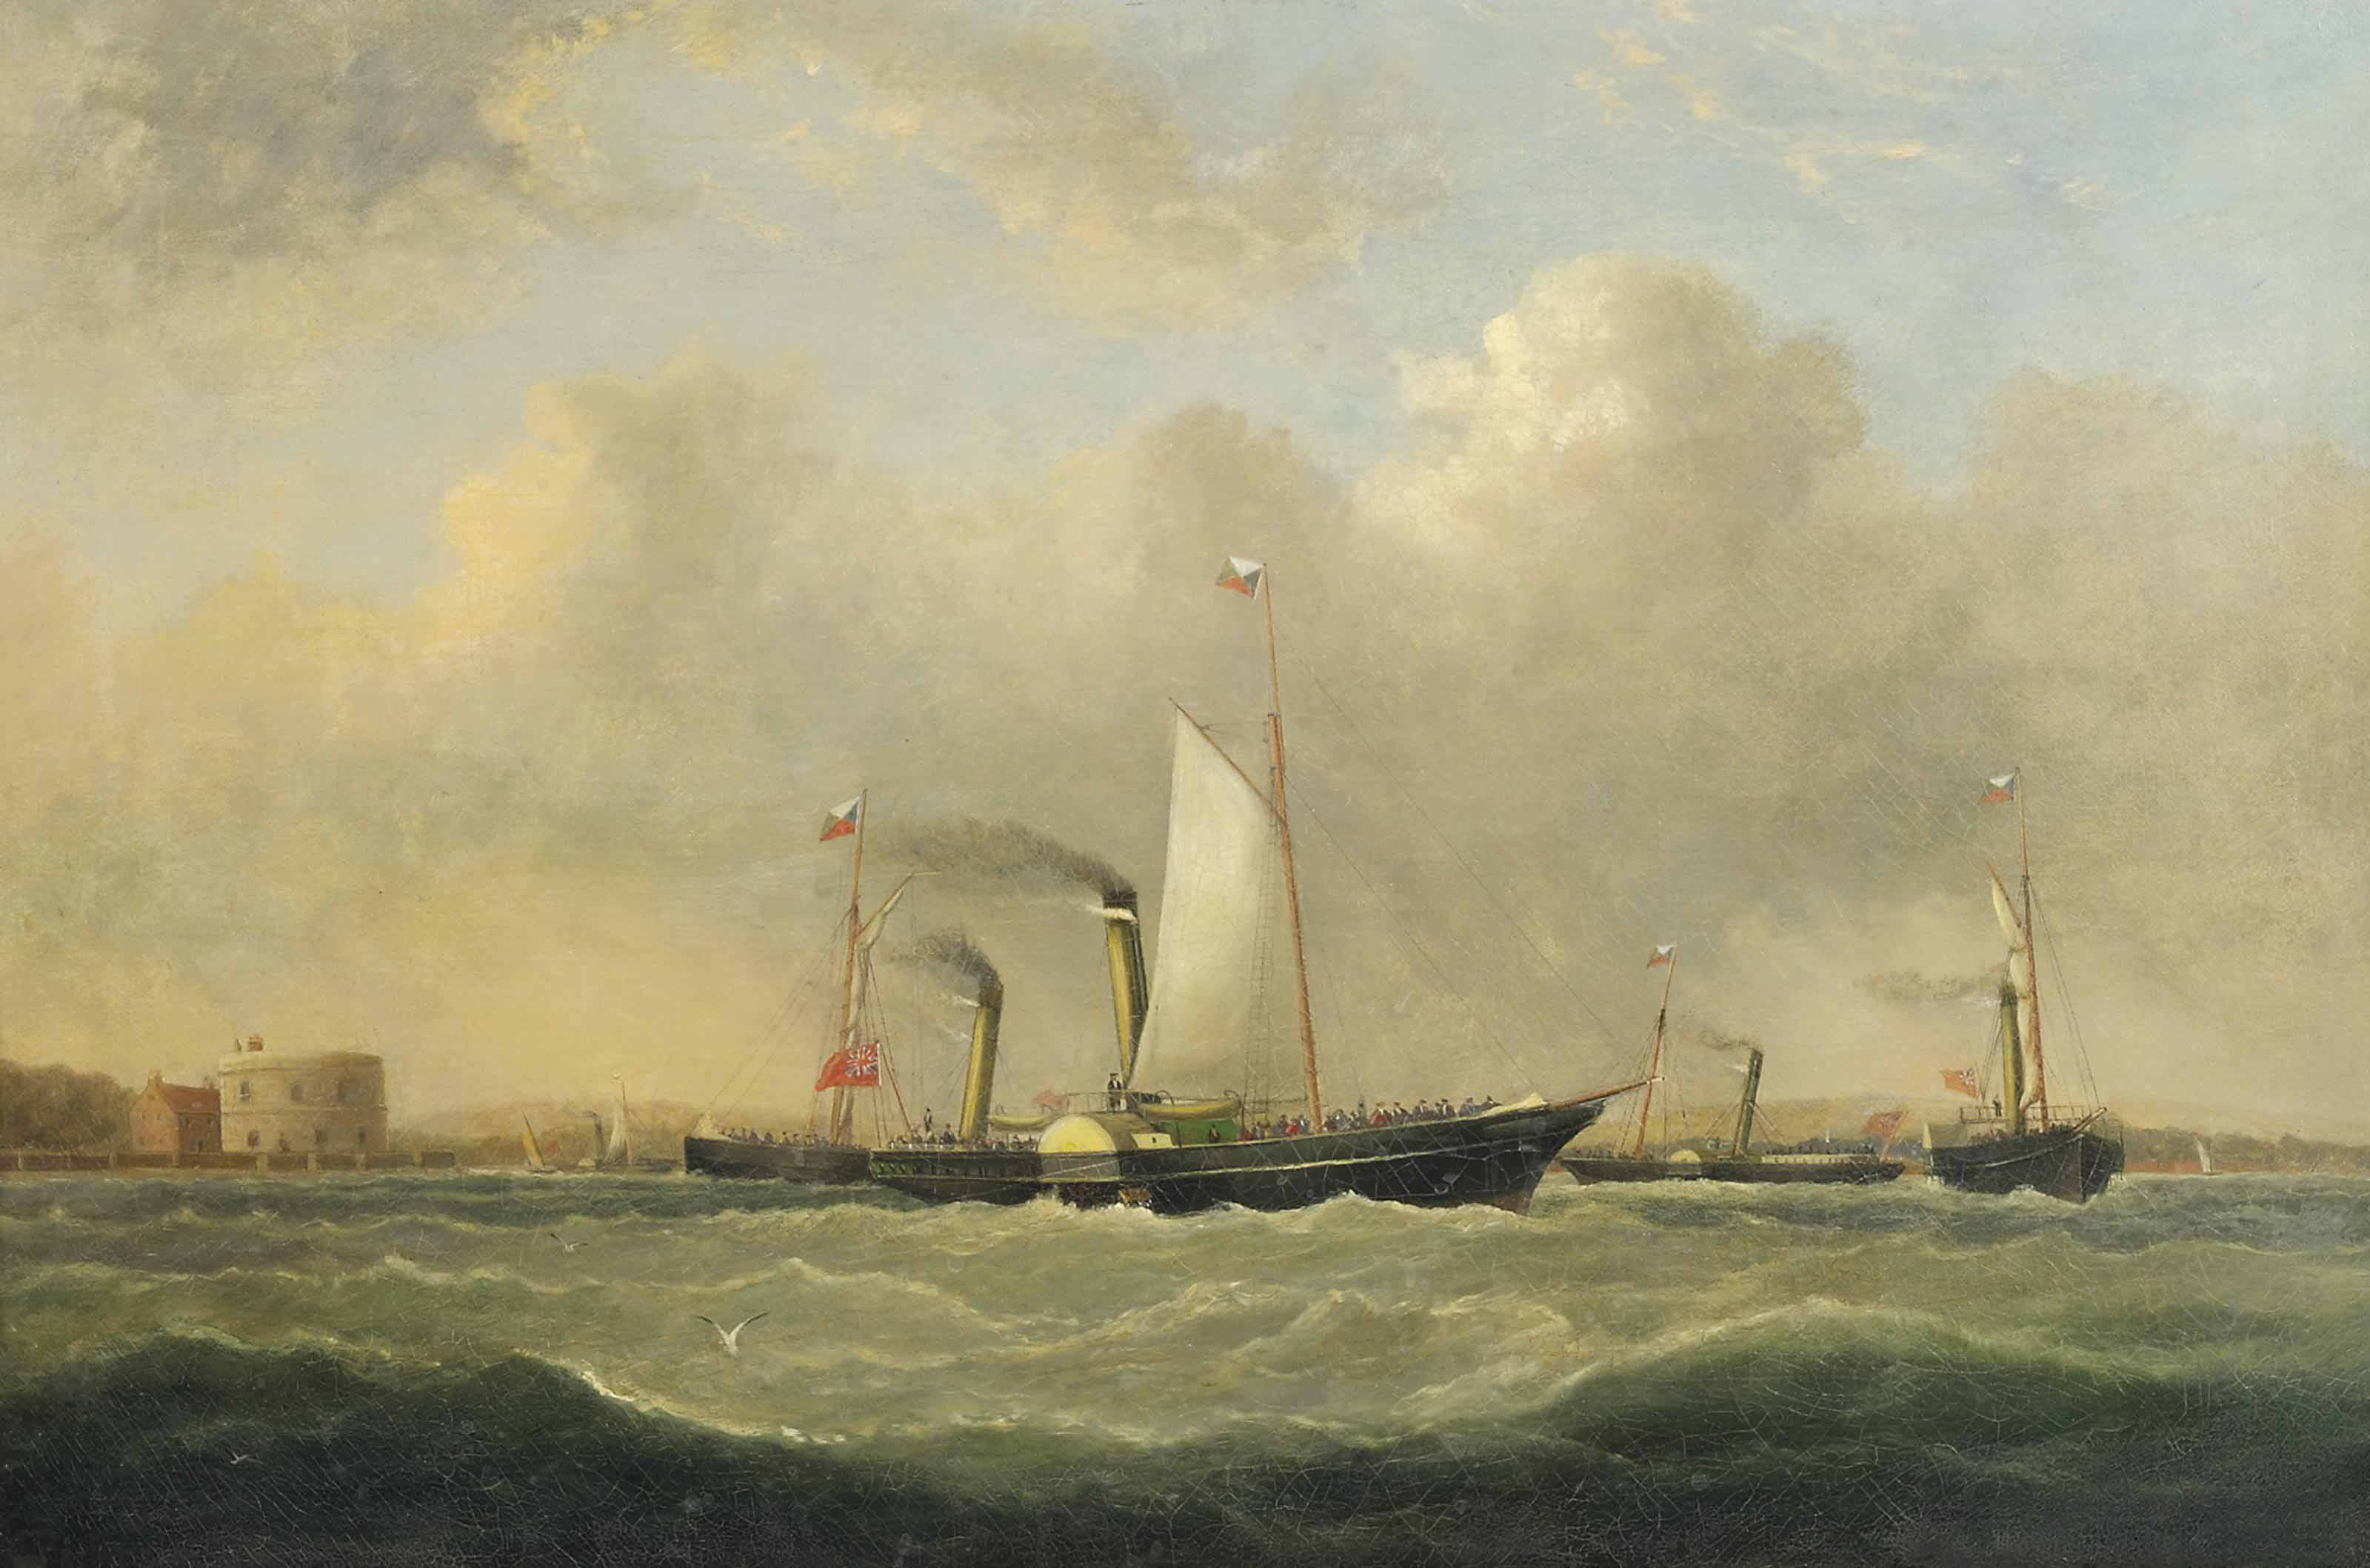 Southampton-Cowes ferries off Calshot Castle